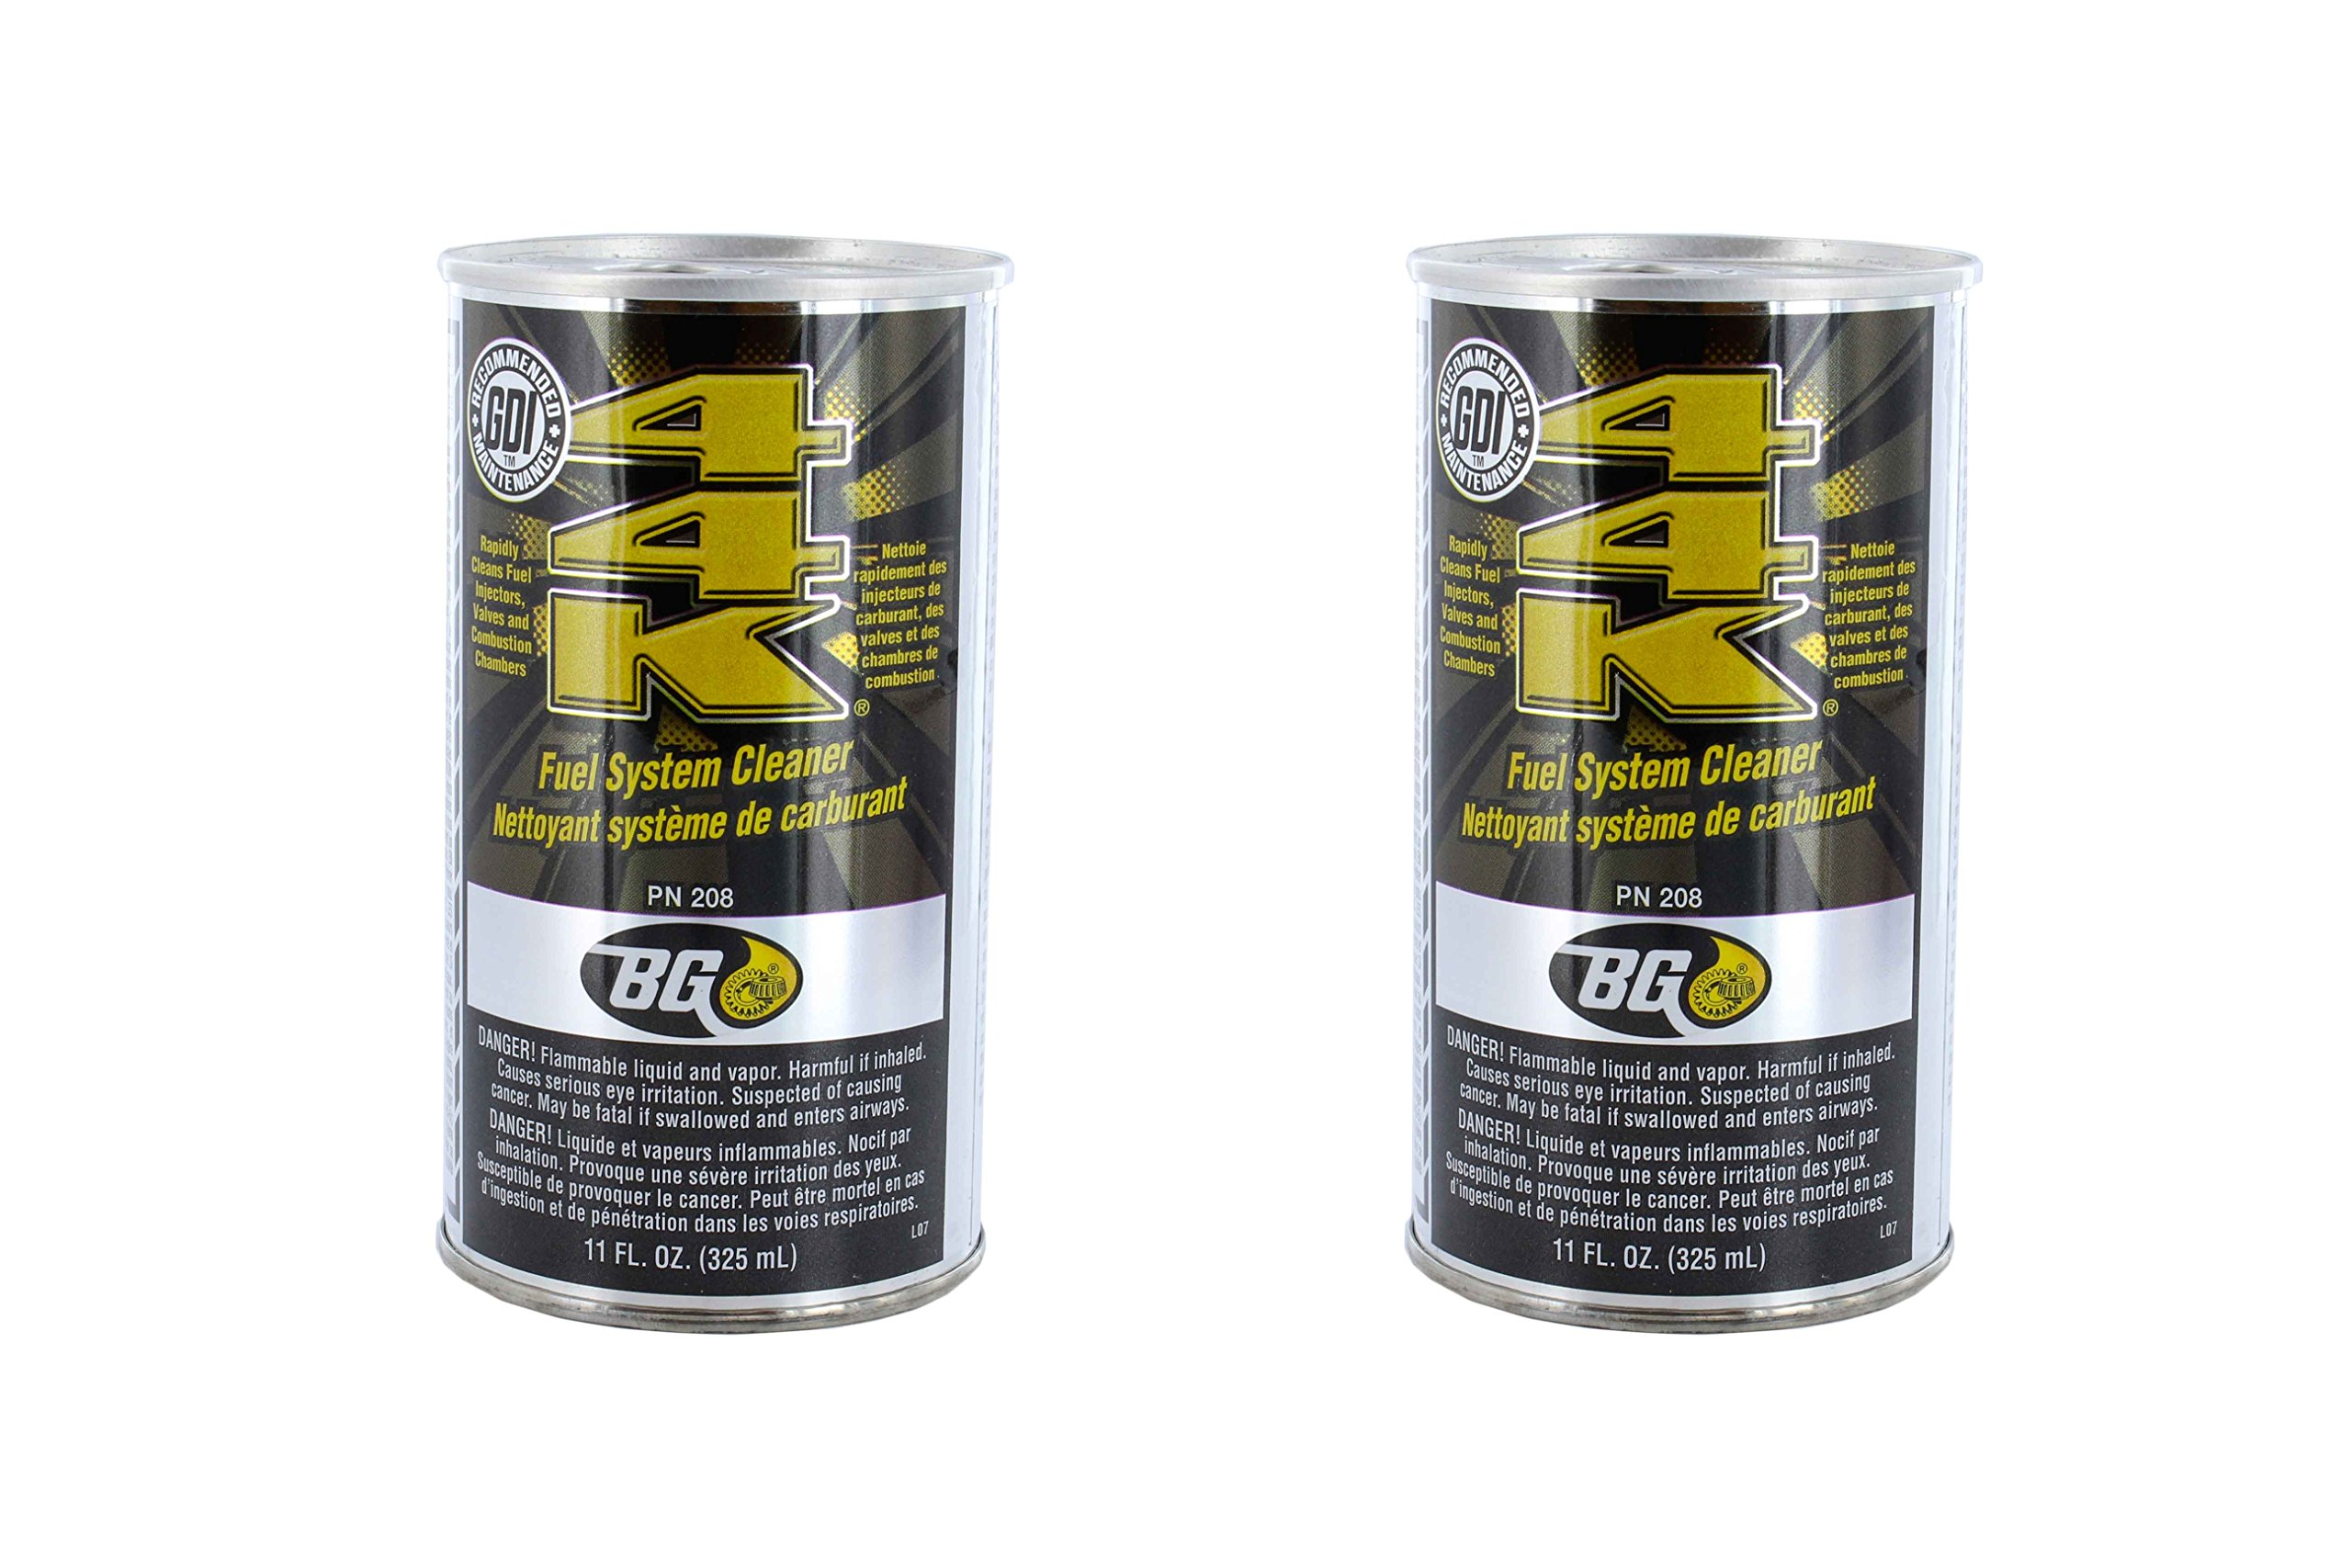 BG 44K Fuel System Cleaner Power Enhancer 2 Pack 11oz can by BG